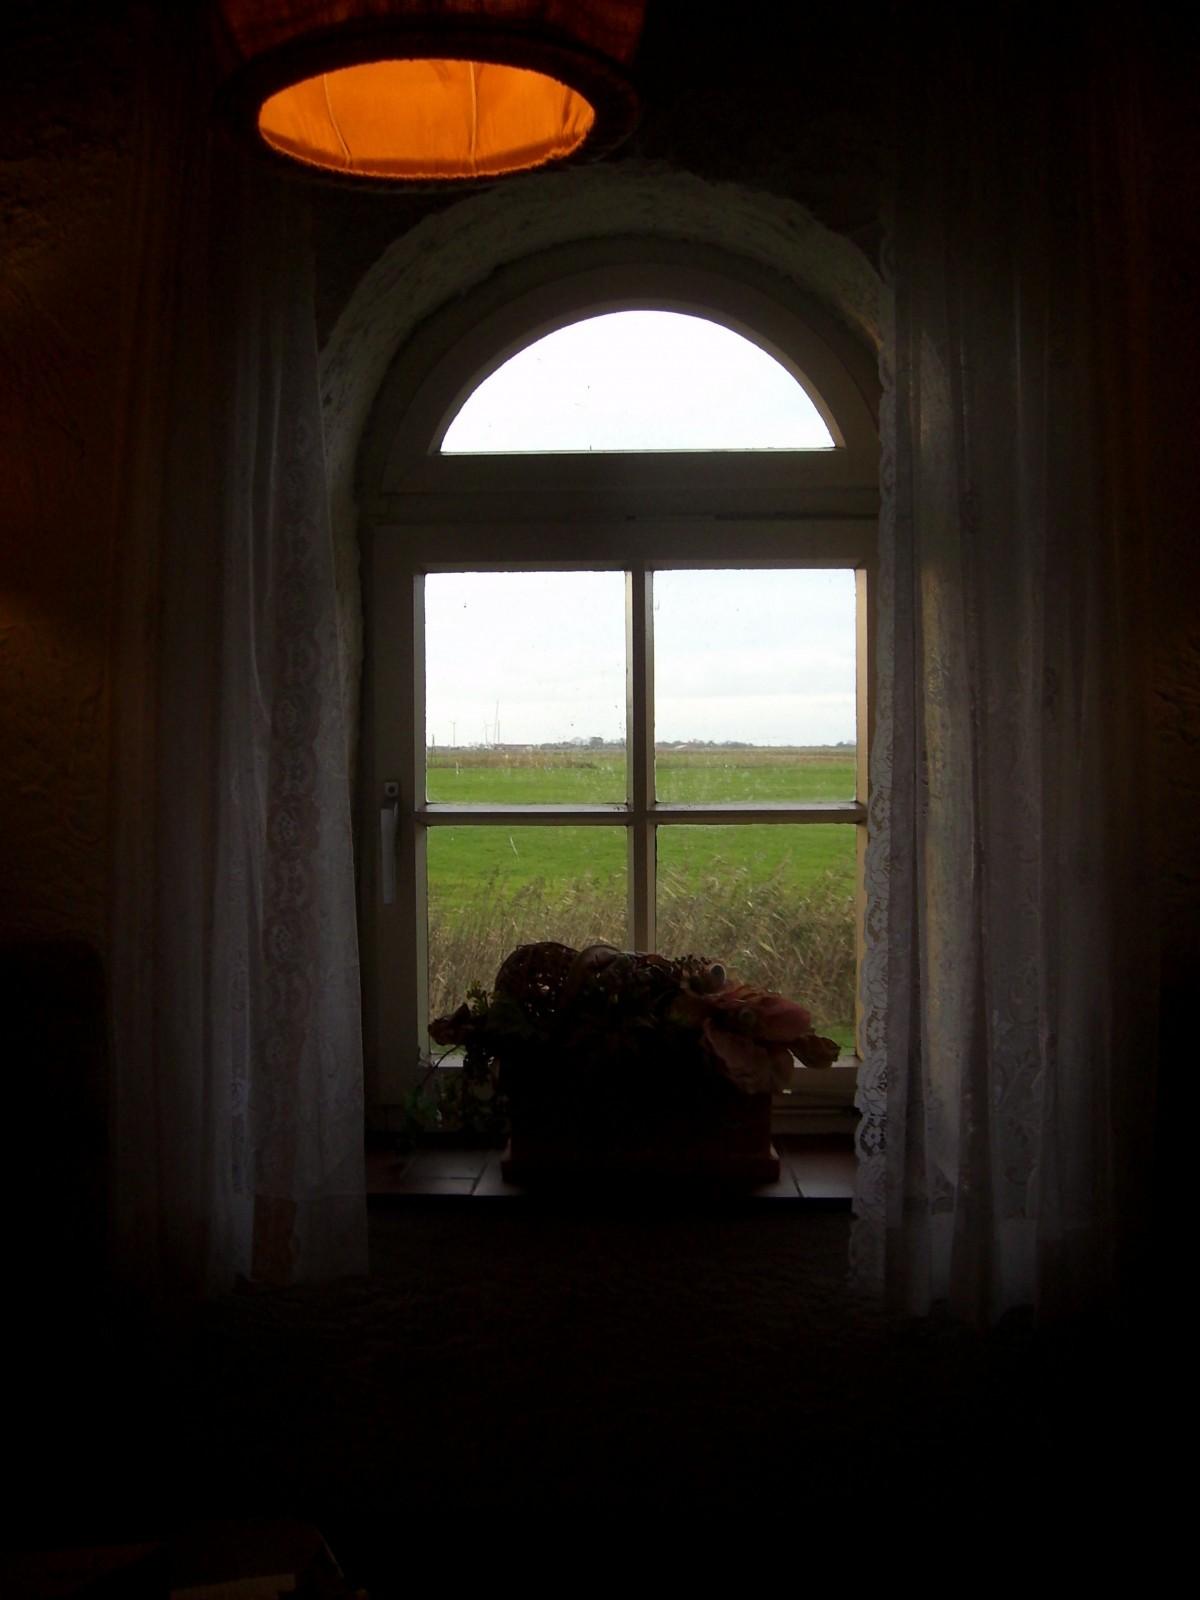 Gratis afbeeldingen licht architectuur venster glas donker boog schaduw duisternis - Interieur oud huis ...